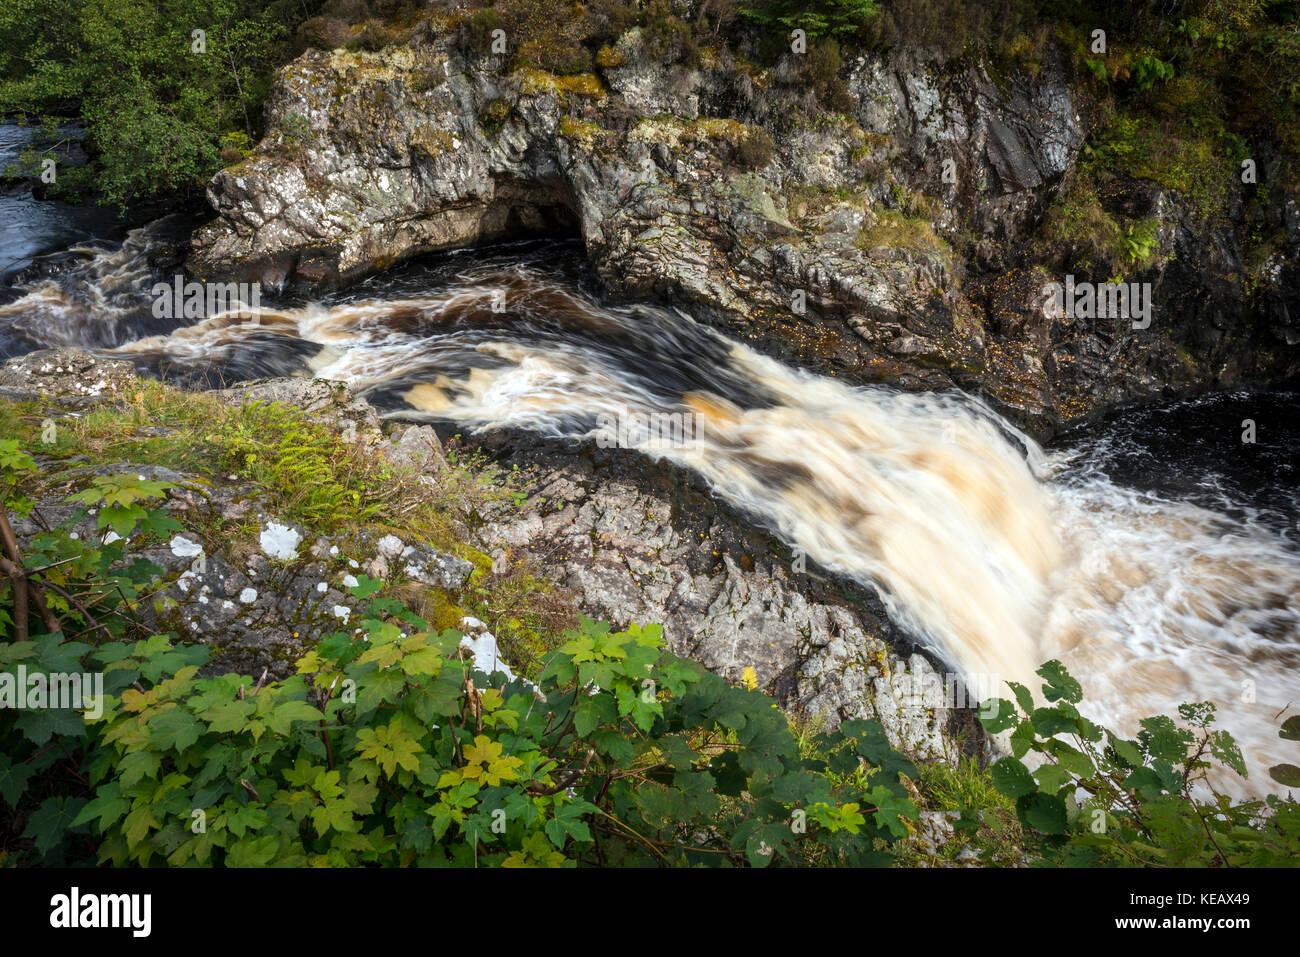 The Falls of Shin near Lairg in Sutherland, Scottish Highlands, UK Stock Photo